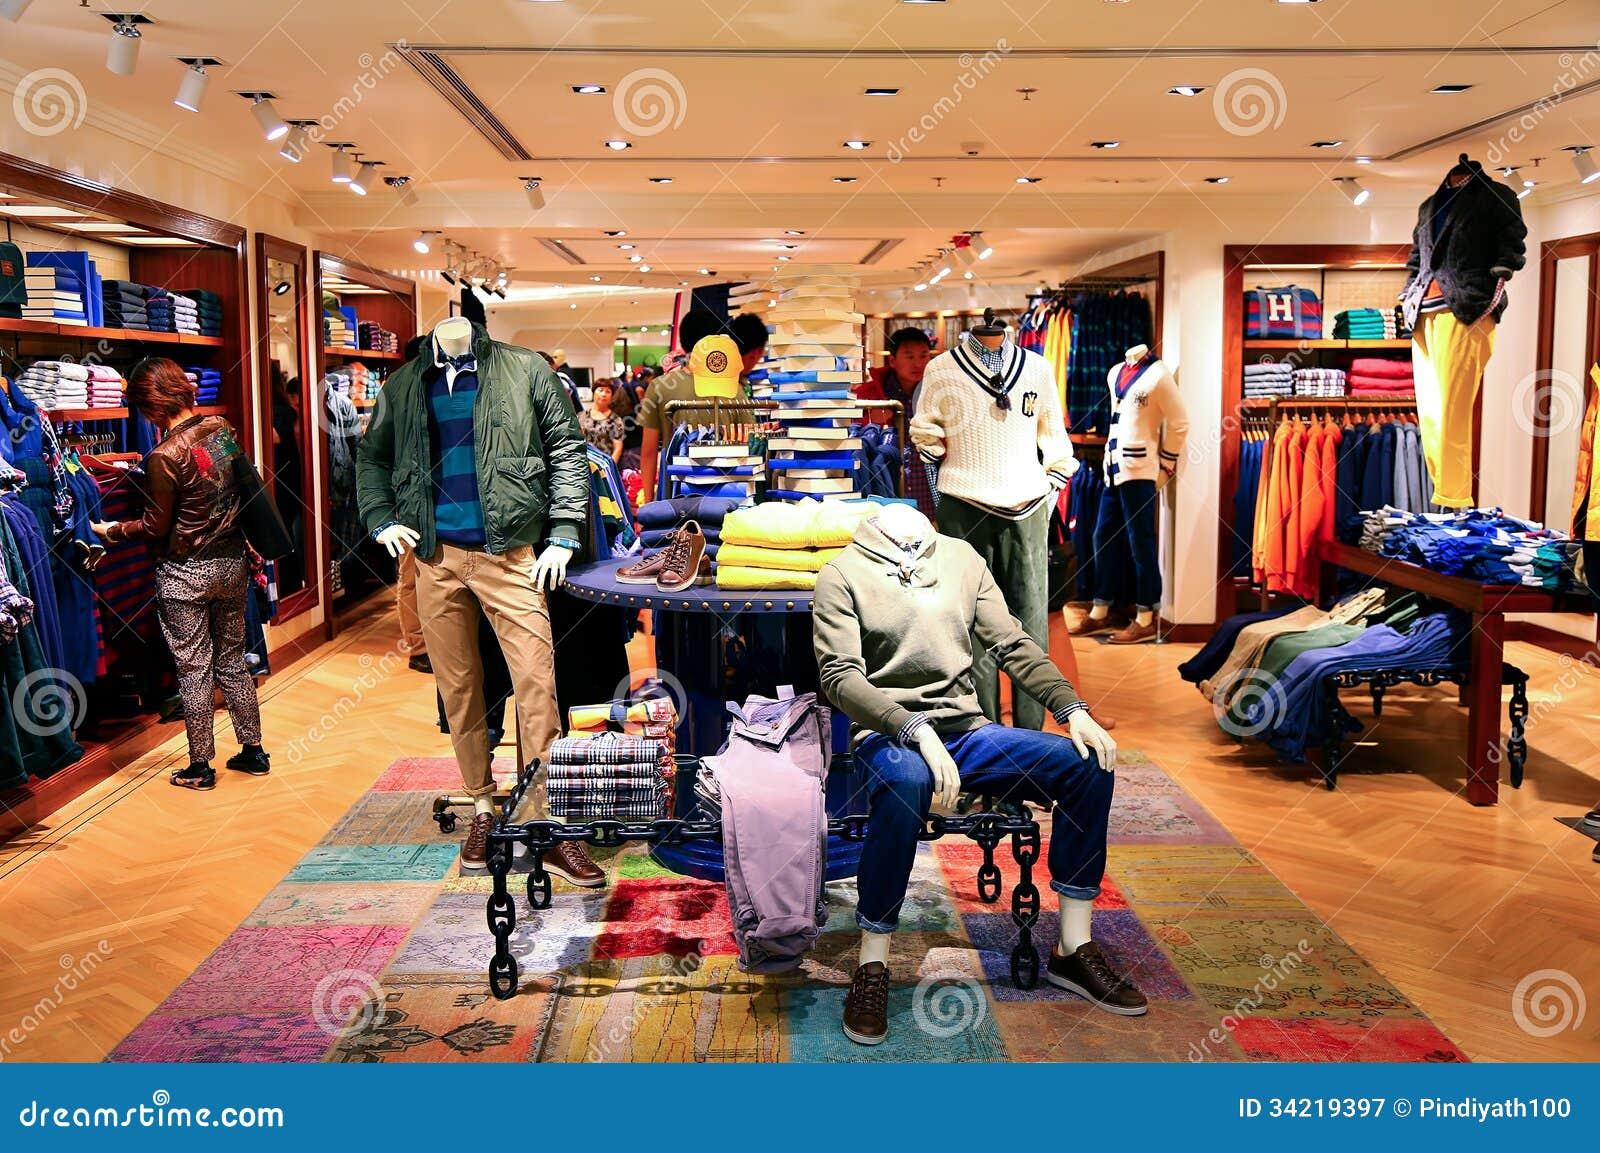 How to Properly Store Winter Clothes | Operandi Moda